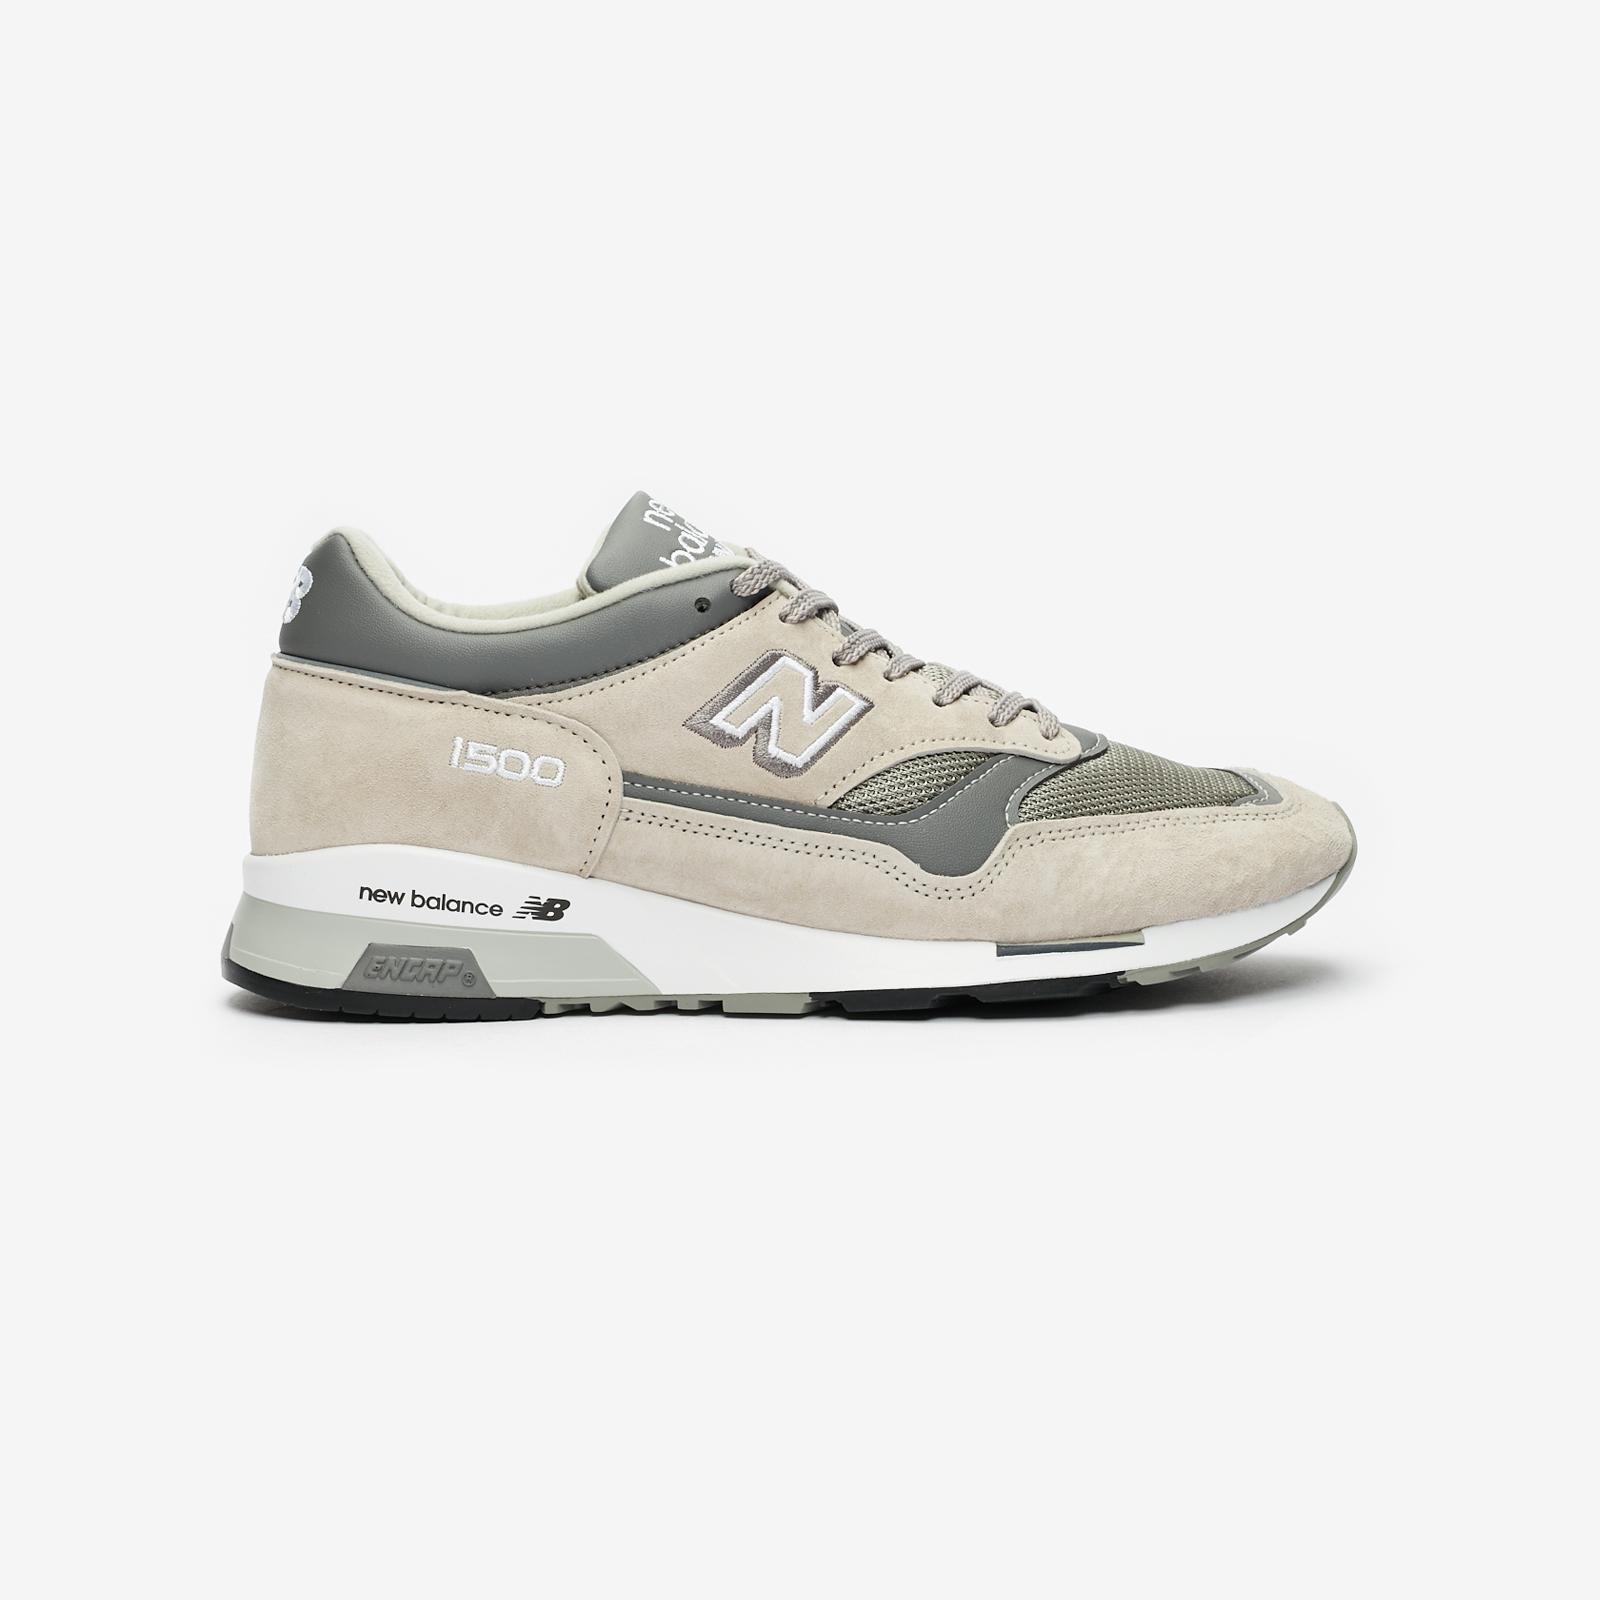 New Balance M1500 - M1500pgl - Sneakersnstuff | sneakers ...